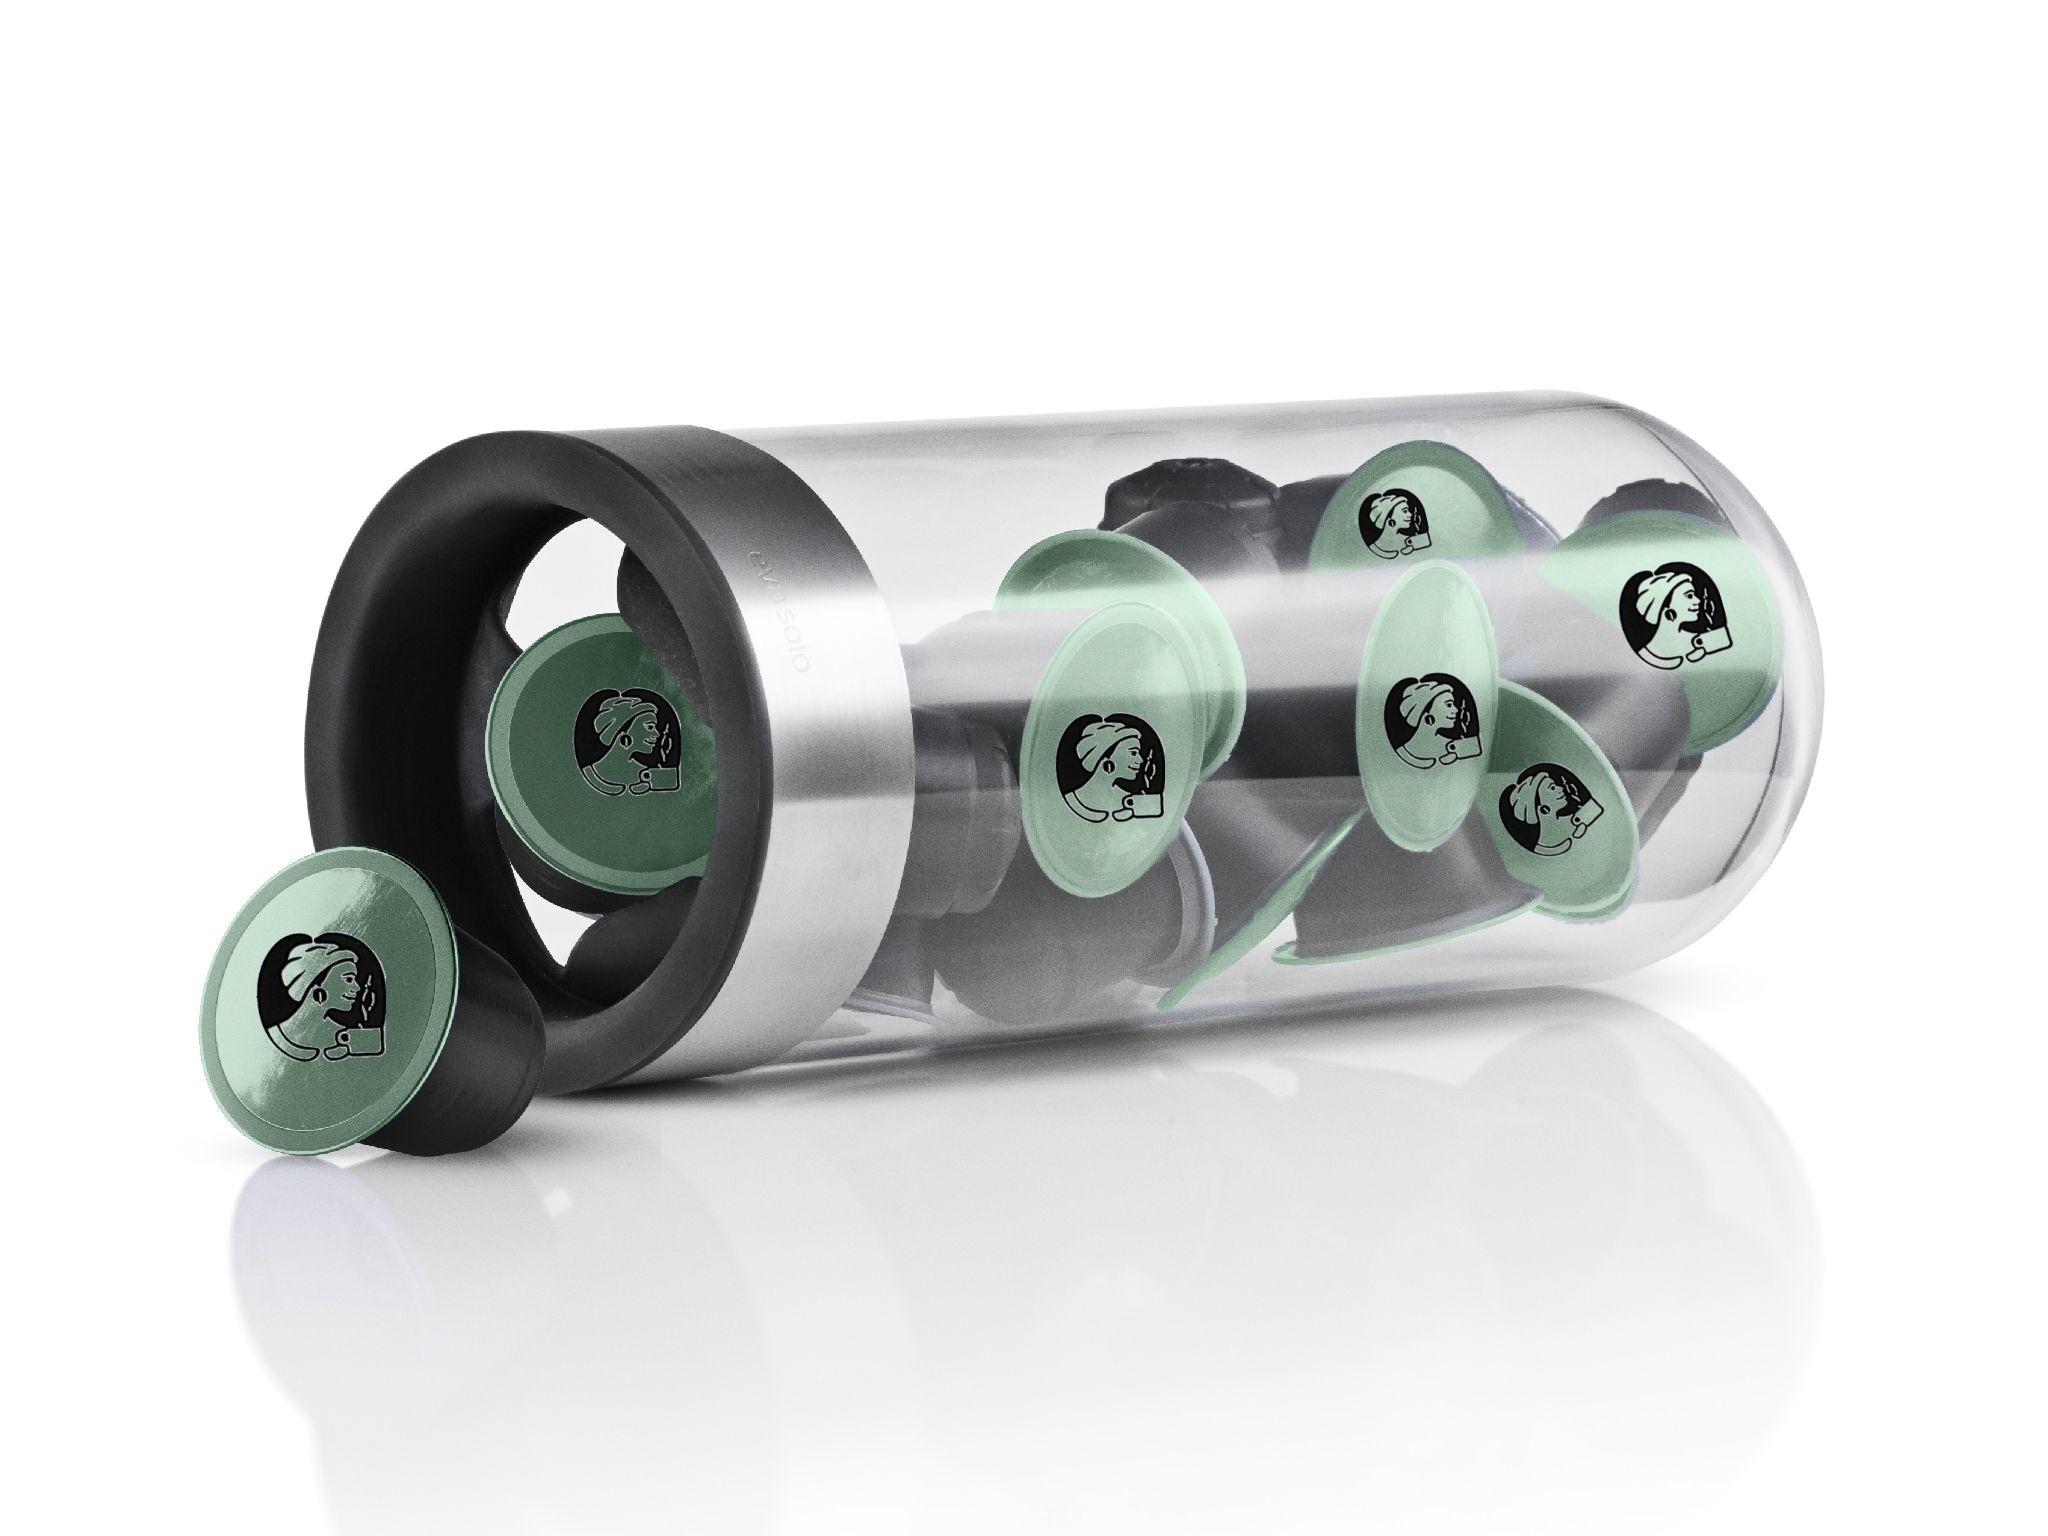 distributeur-de-capsules-de-cafe-eva-solo-a-s-nordisk-design-ag-37e